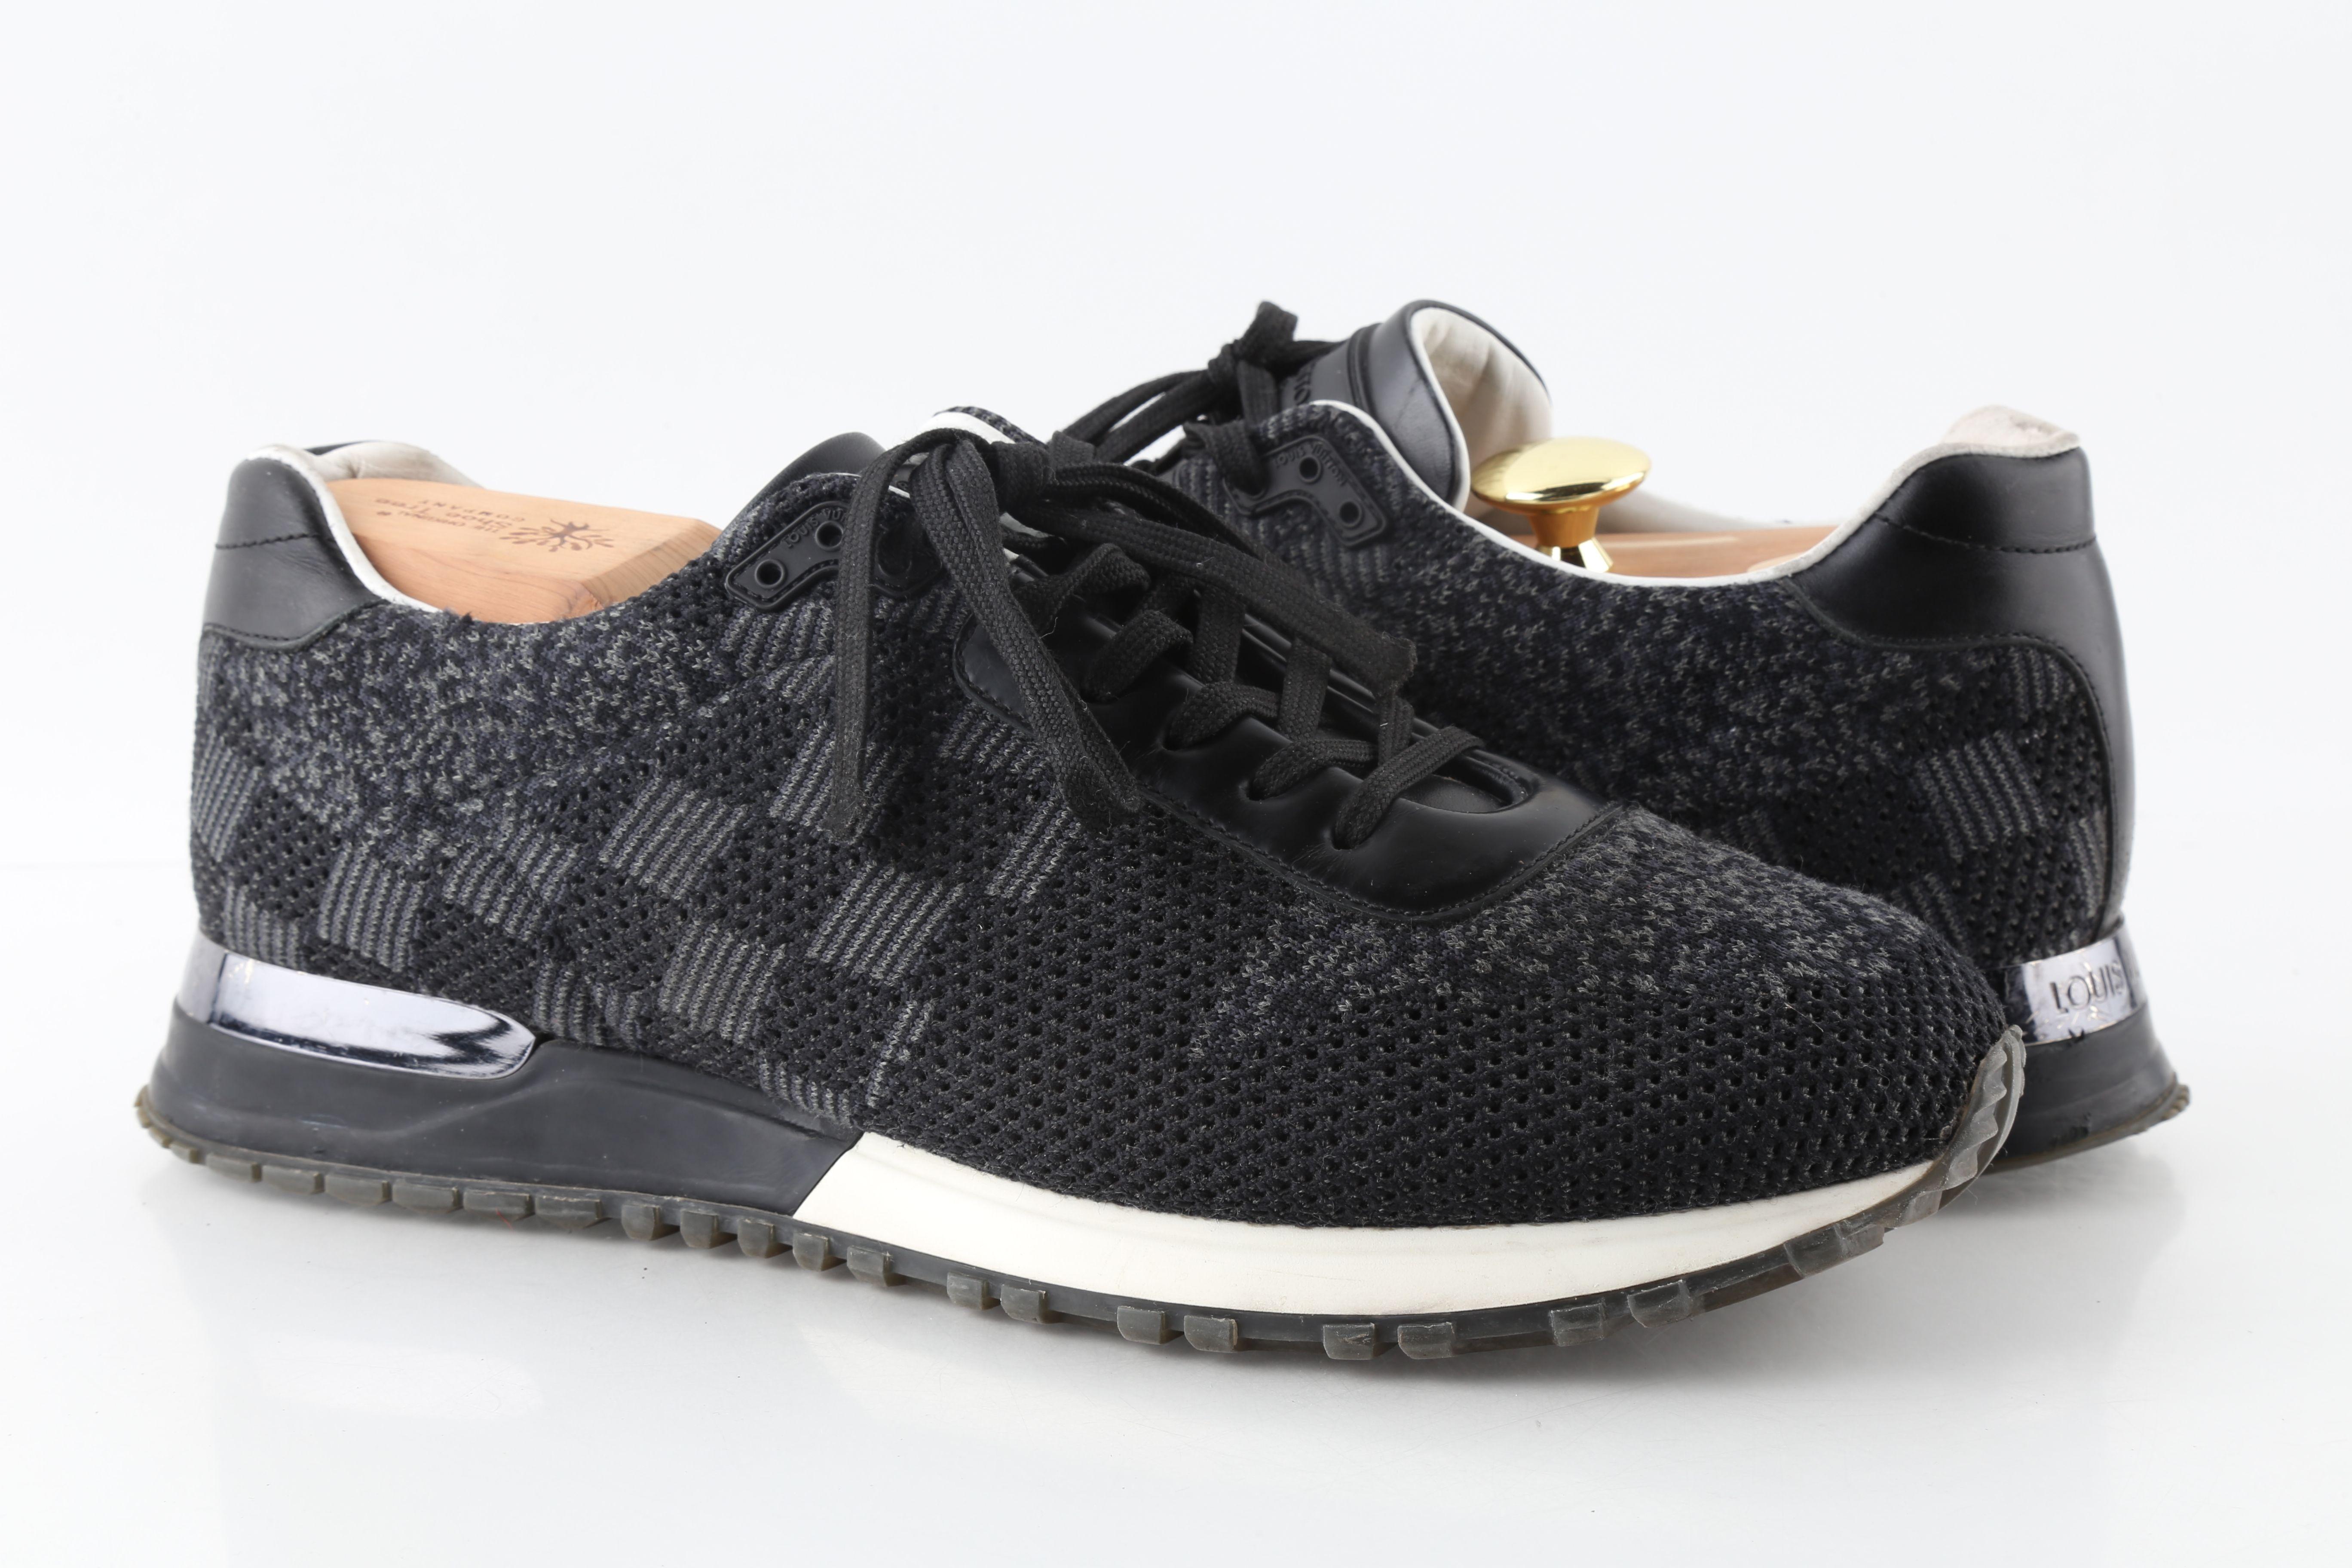 louis vuitton sneakers black